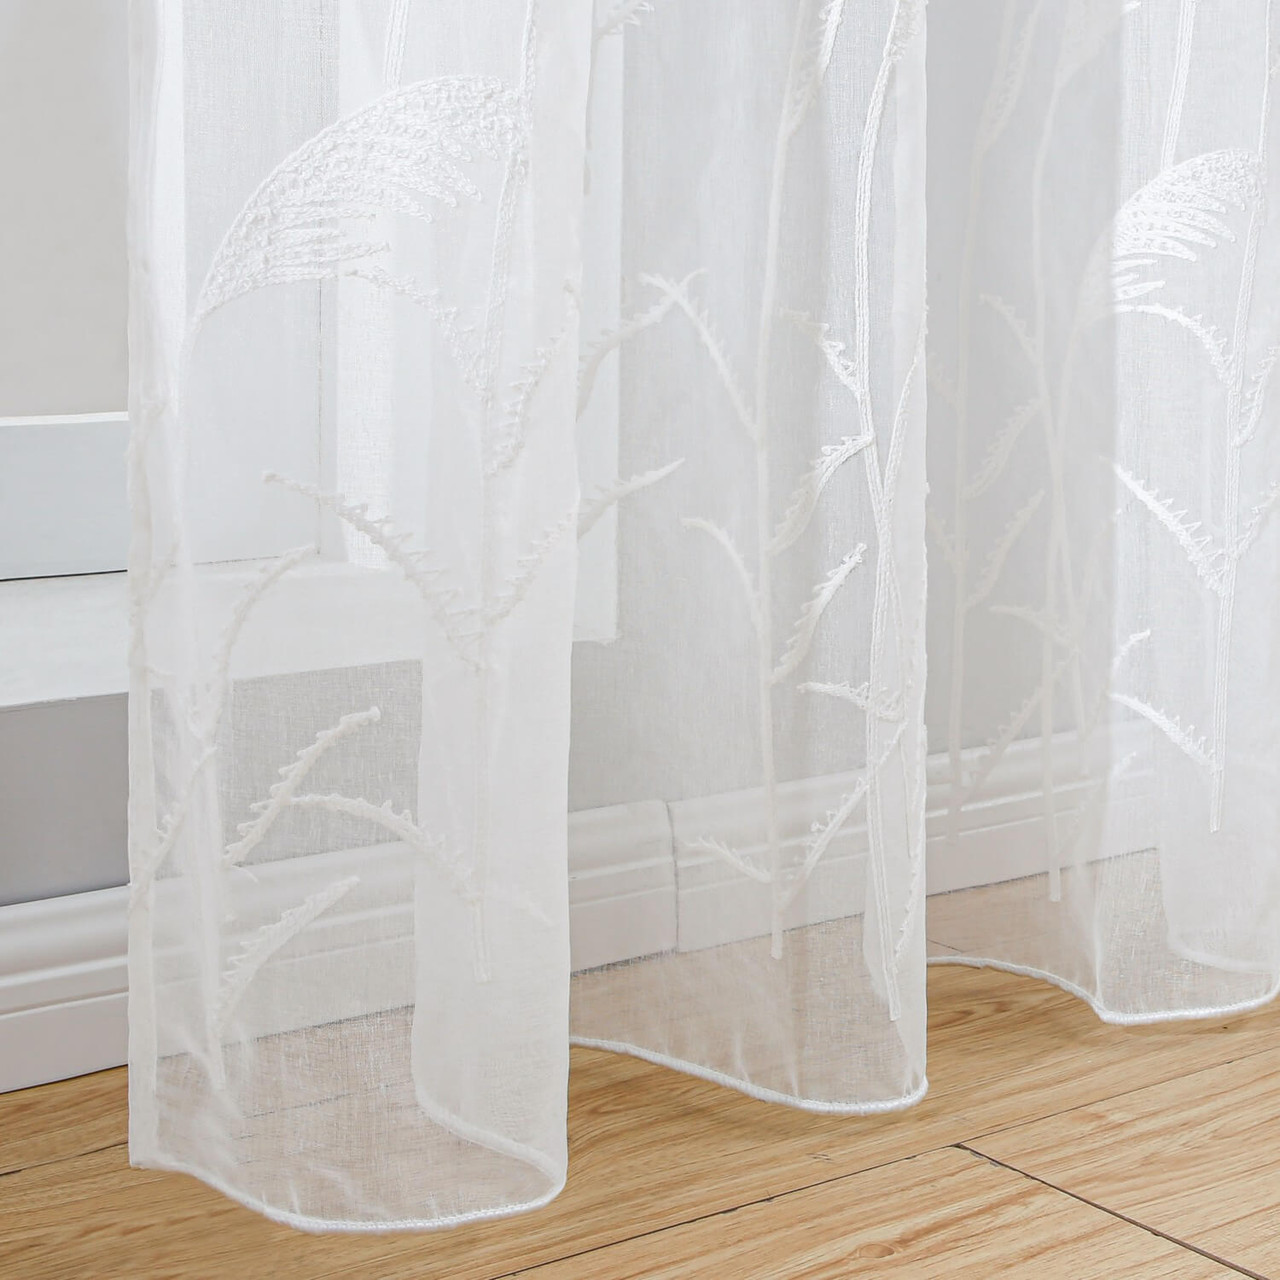 Dolce Mela 8171460151778 Sheer Curtain Panel Grommet-Top Window Treatments DMC725